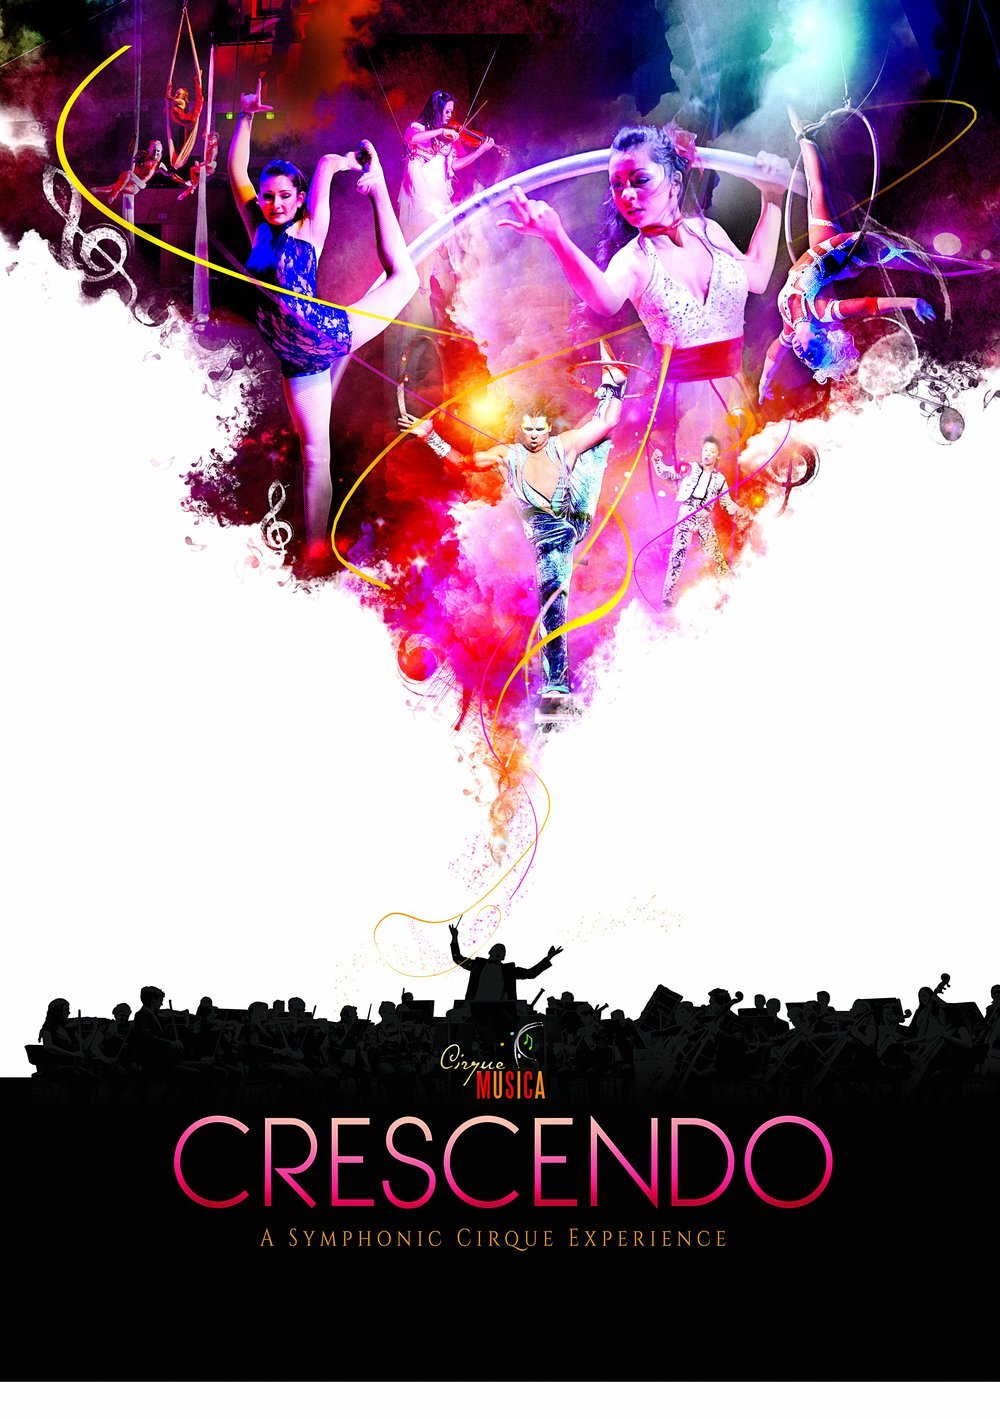 CirqueMusica_Crescendo_FINAL.jpg